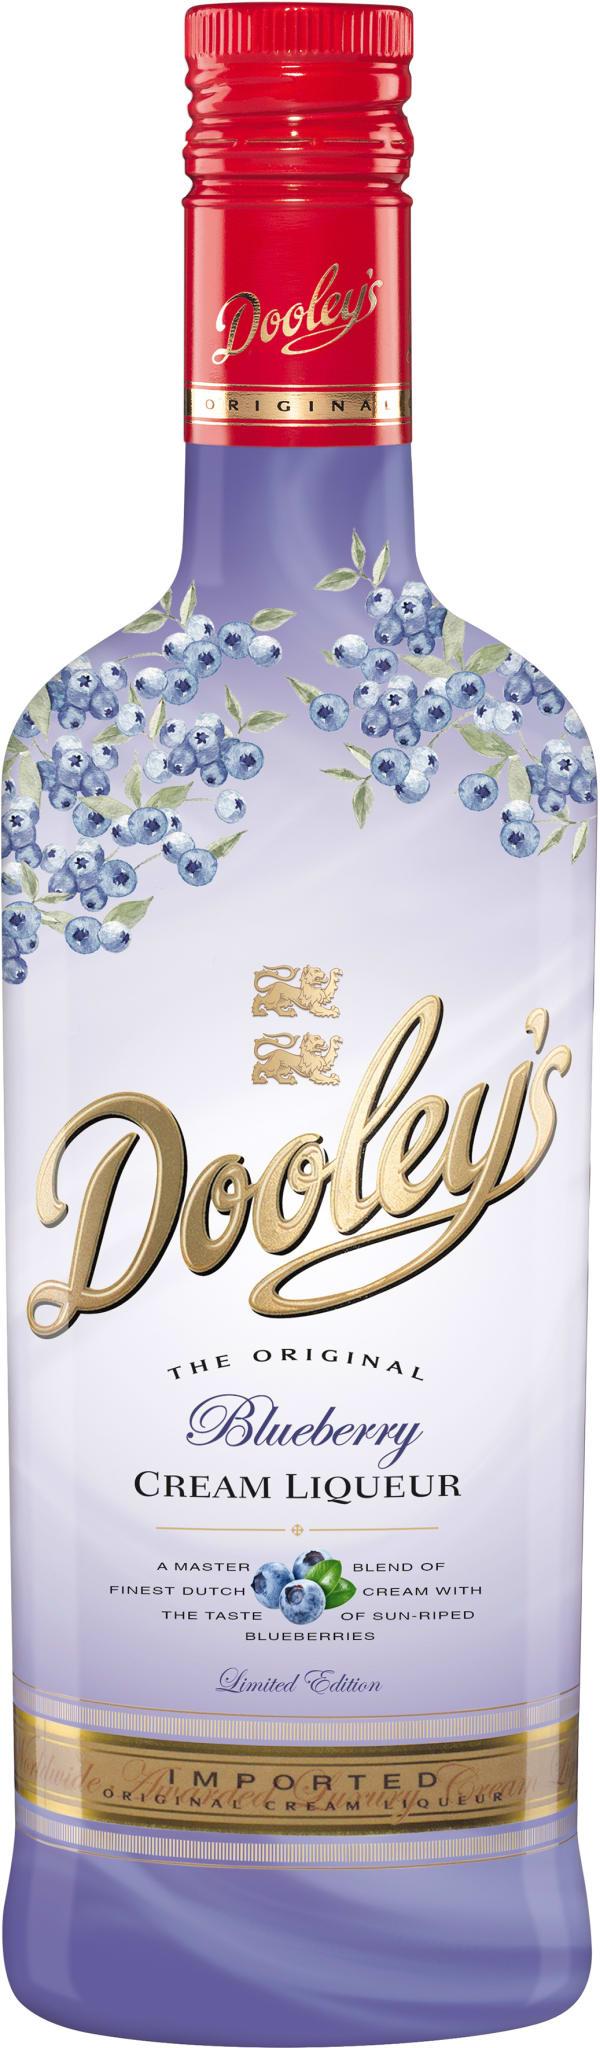 Dooley's Blueberry Cream Liqueur